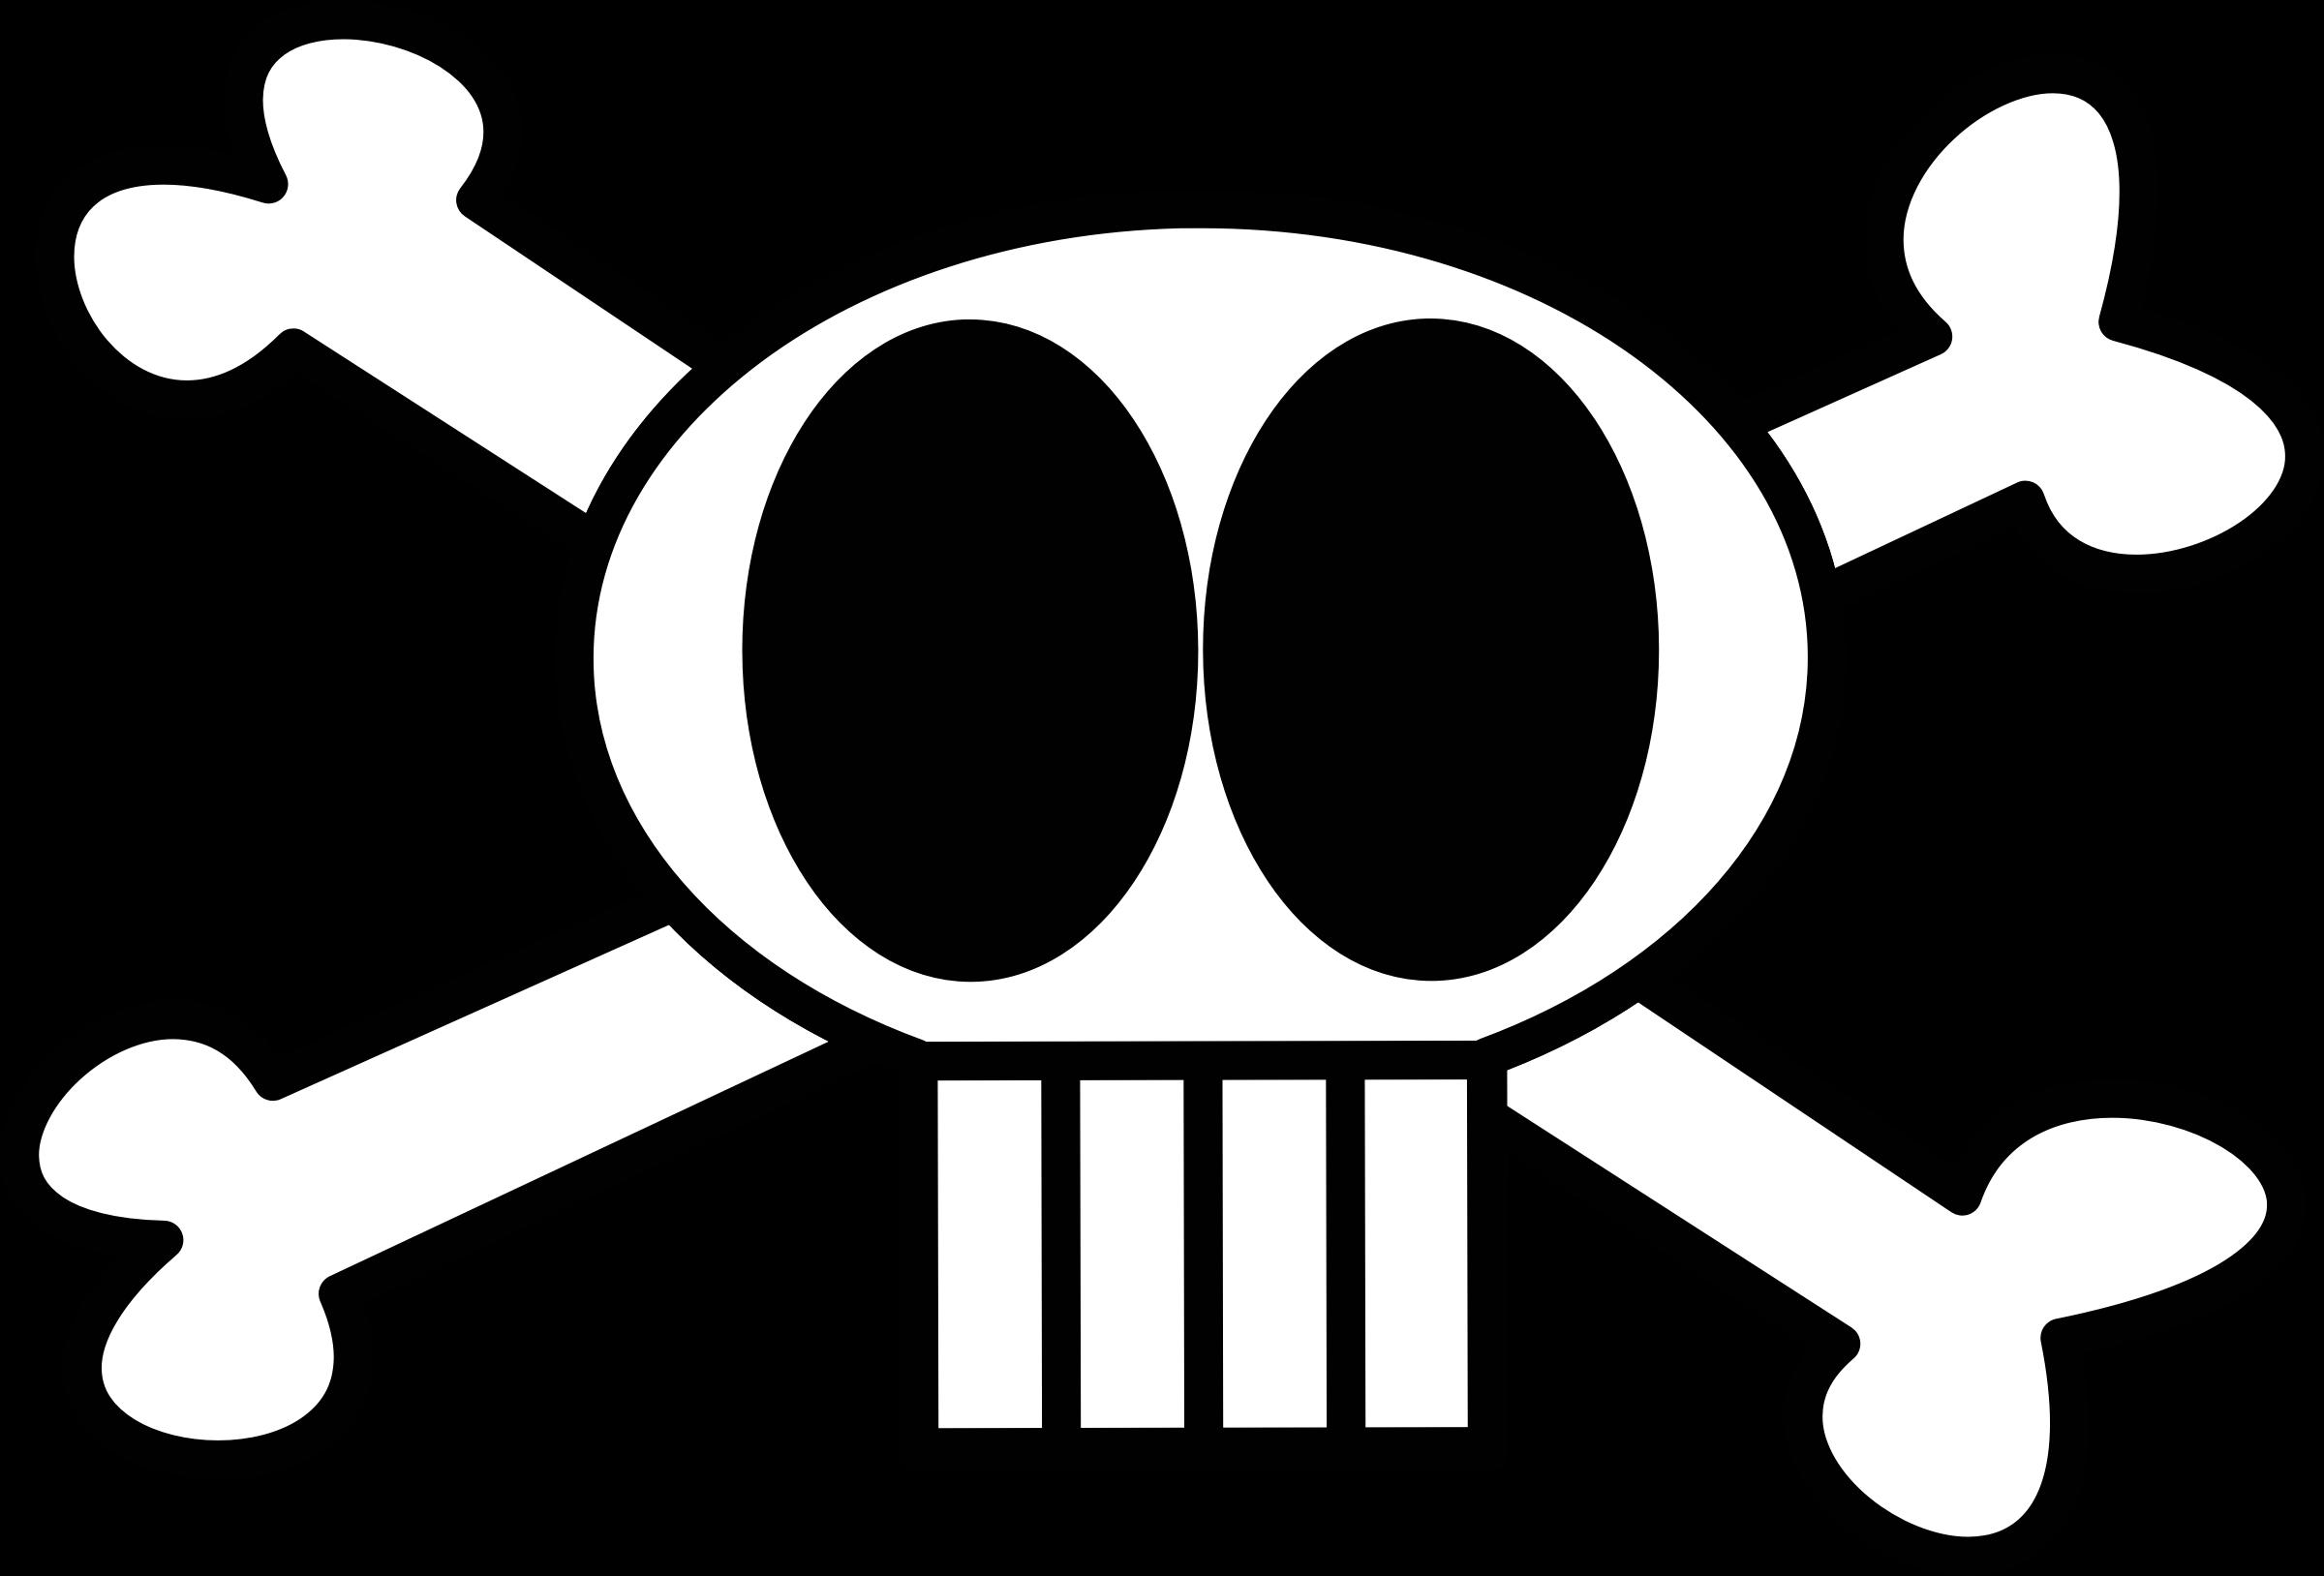 Goofy skull big image. Drug clipart animated